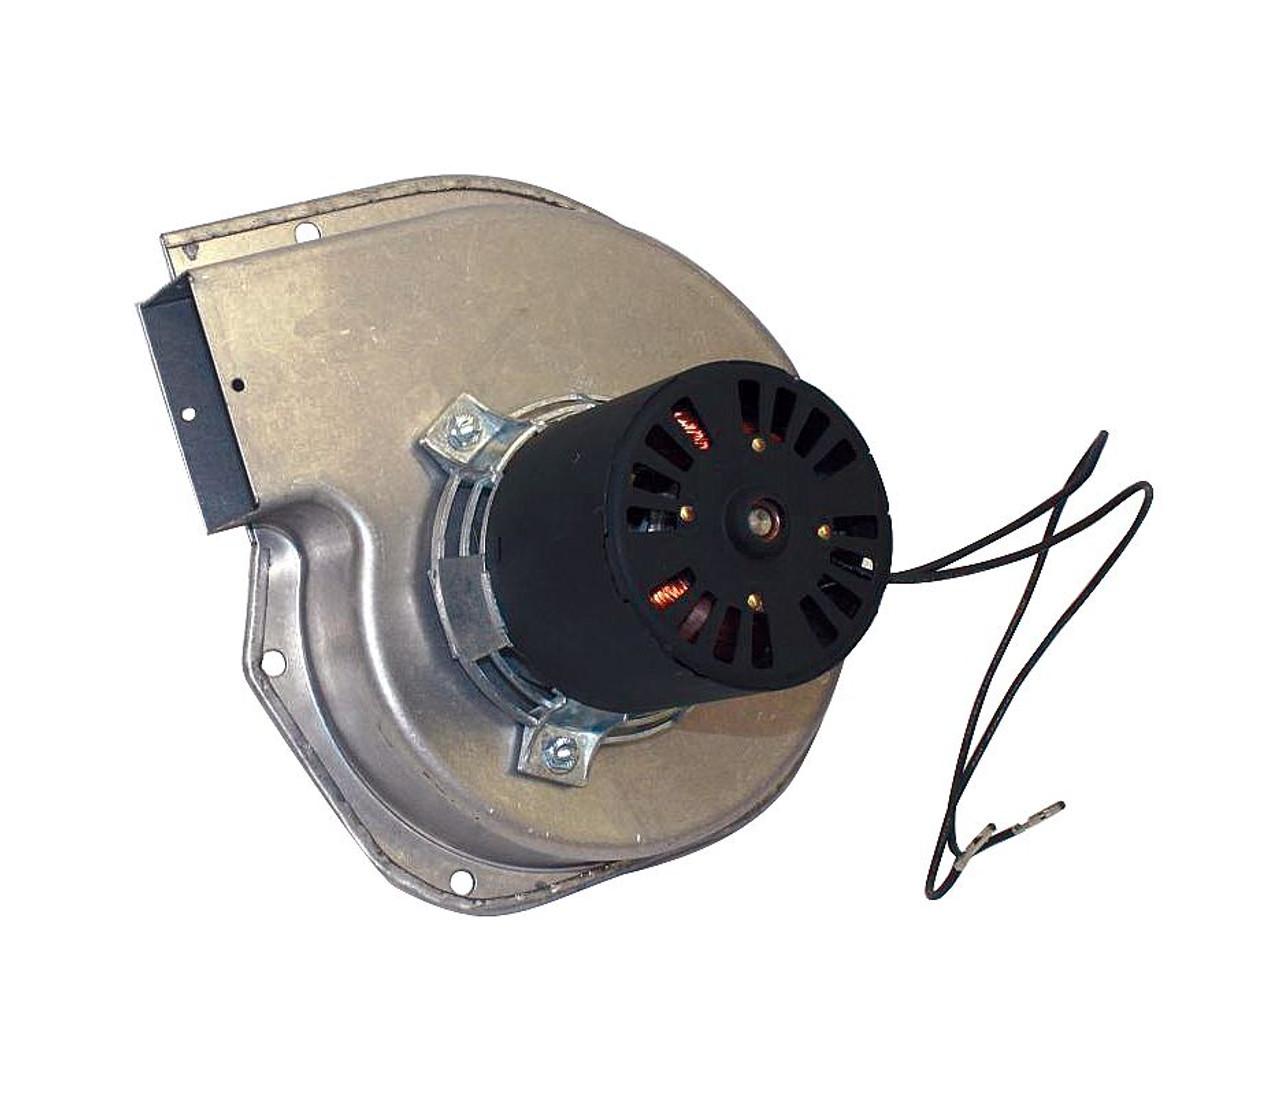 Wiring Diagram Defrost Timer Wiring Diagram Intermatic T104r Wiring